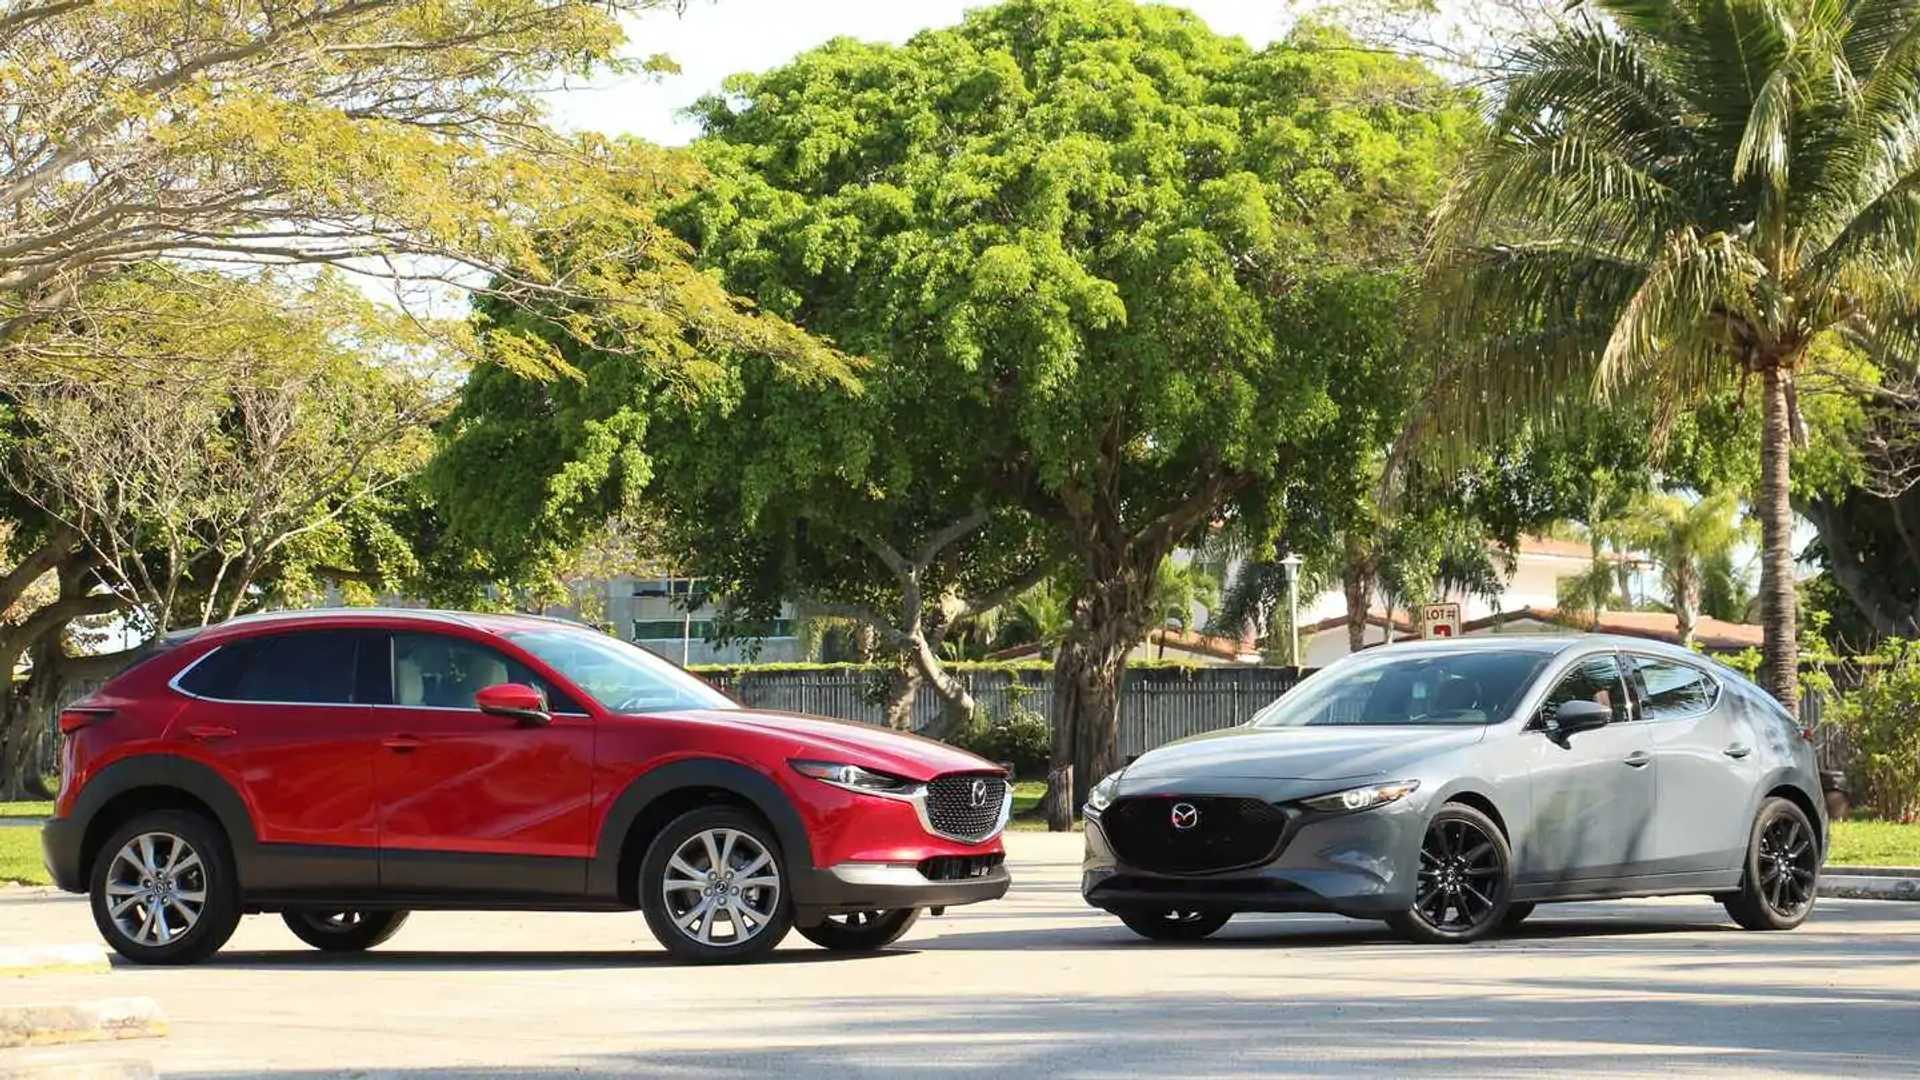 Kelebihan Kekurangan Mazda C30 Top Model Tahun Ini